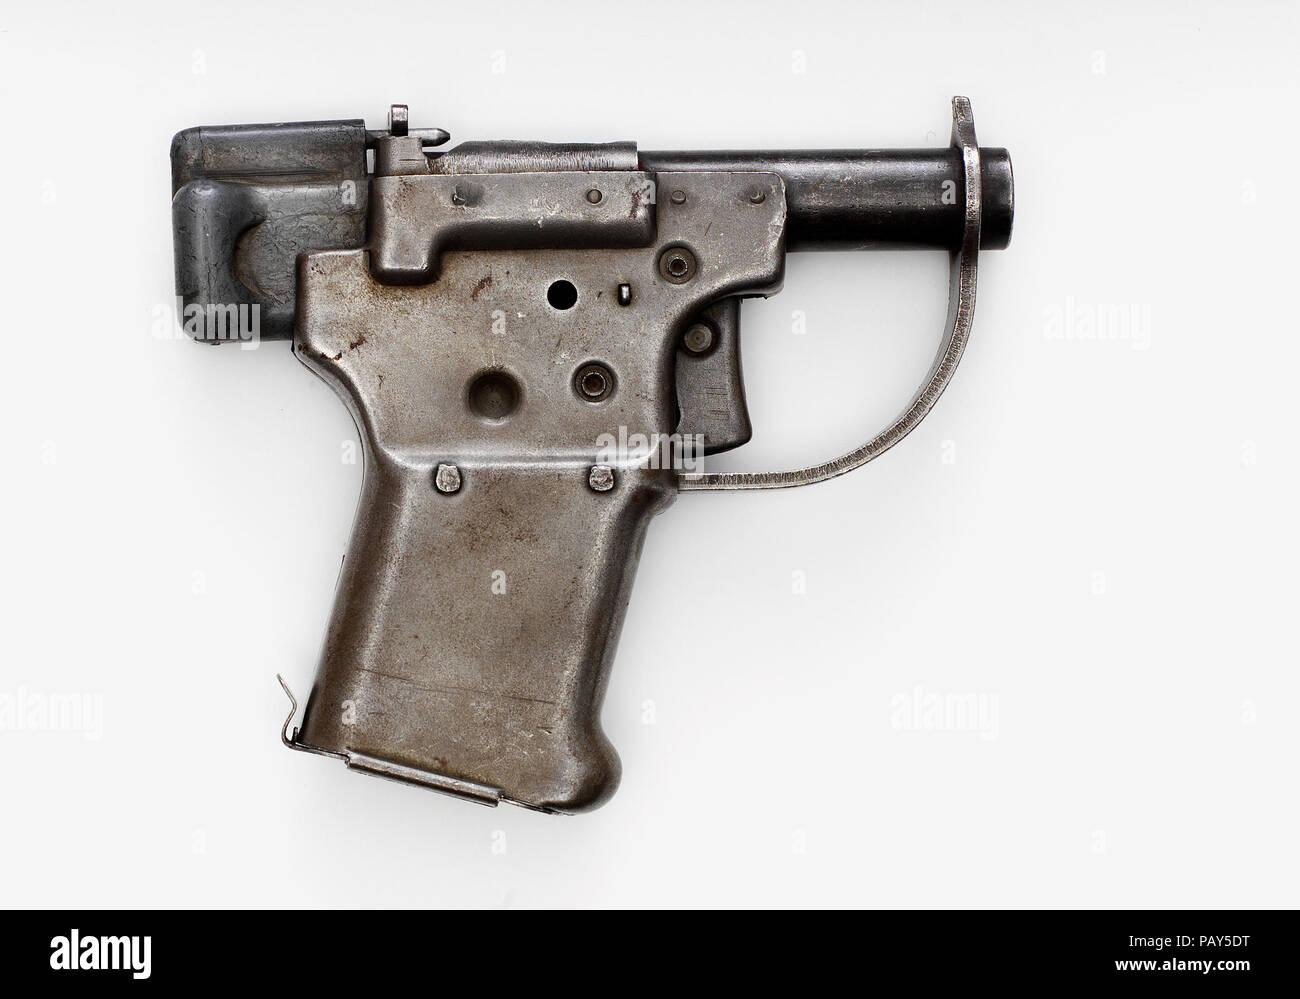 Rp-45 Liberator centerfire Steißlage laden single shot militärischen Pistole Stockbild